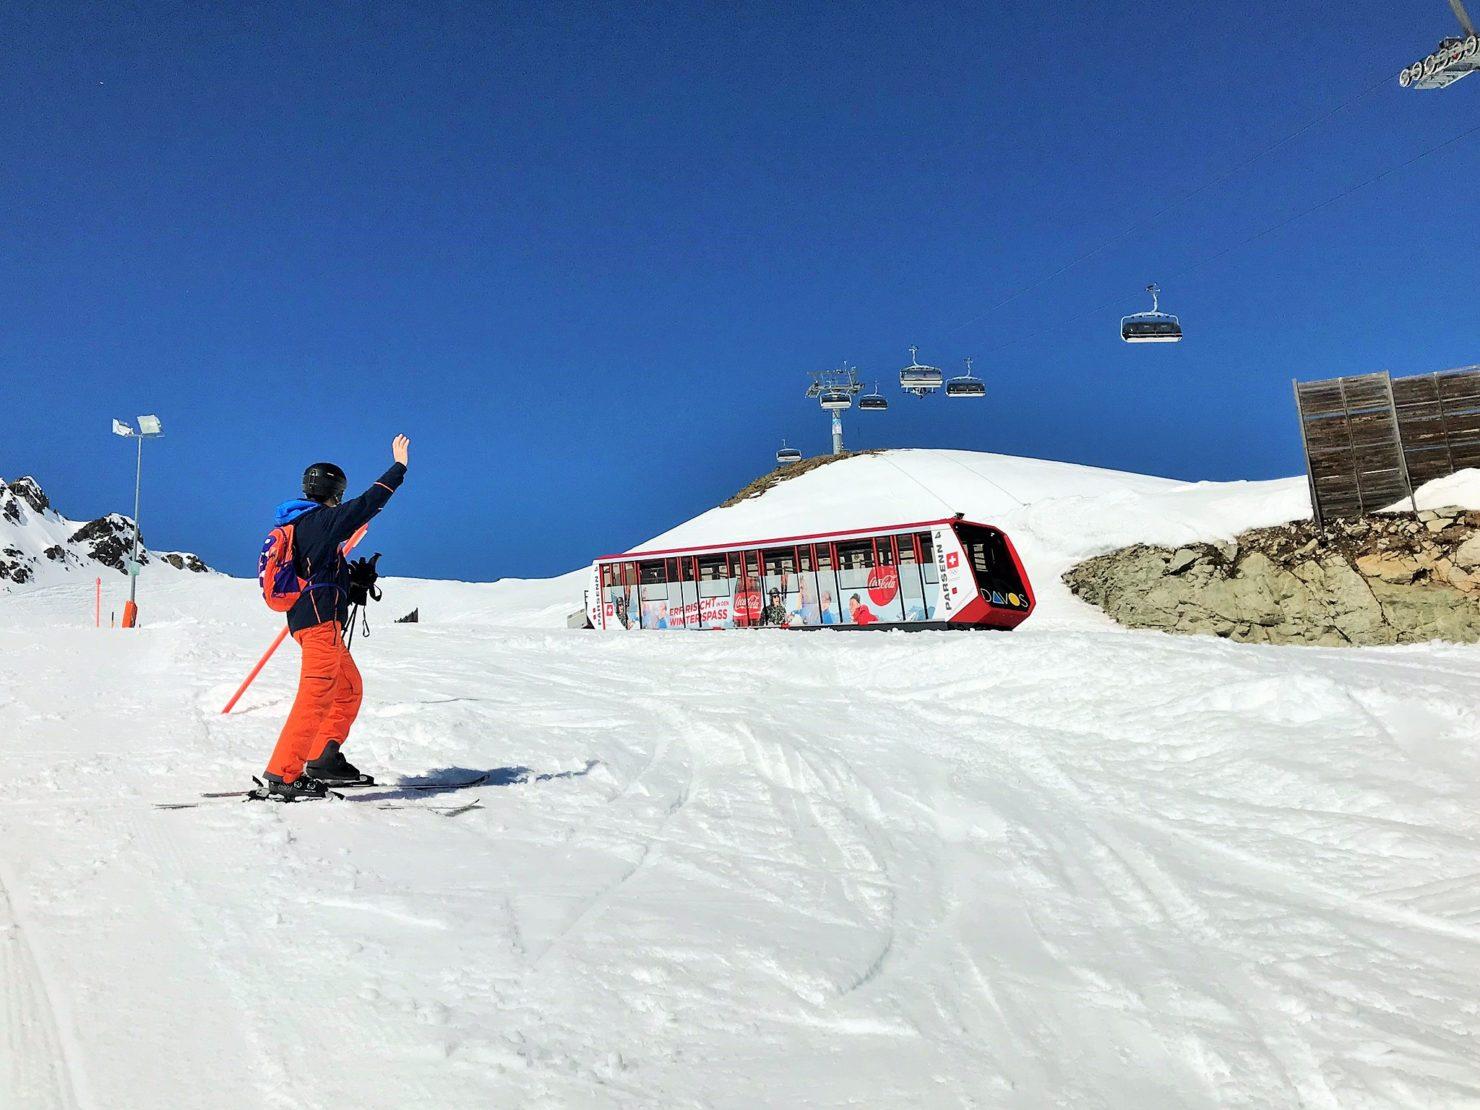 Familien Ski-Weekend in Davos Klosters